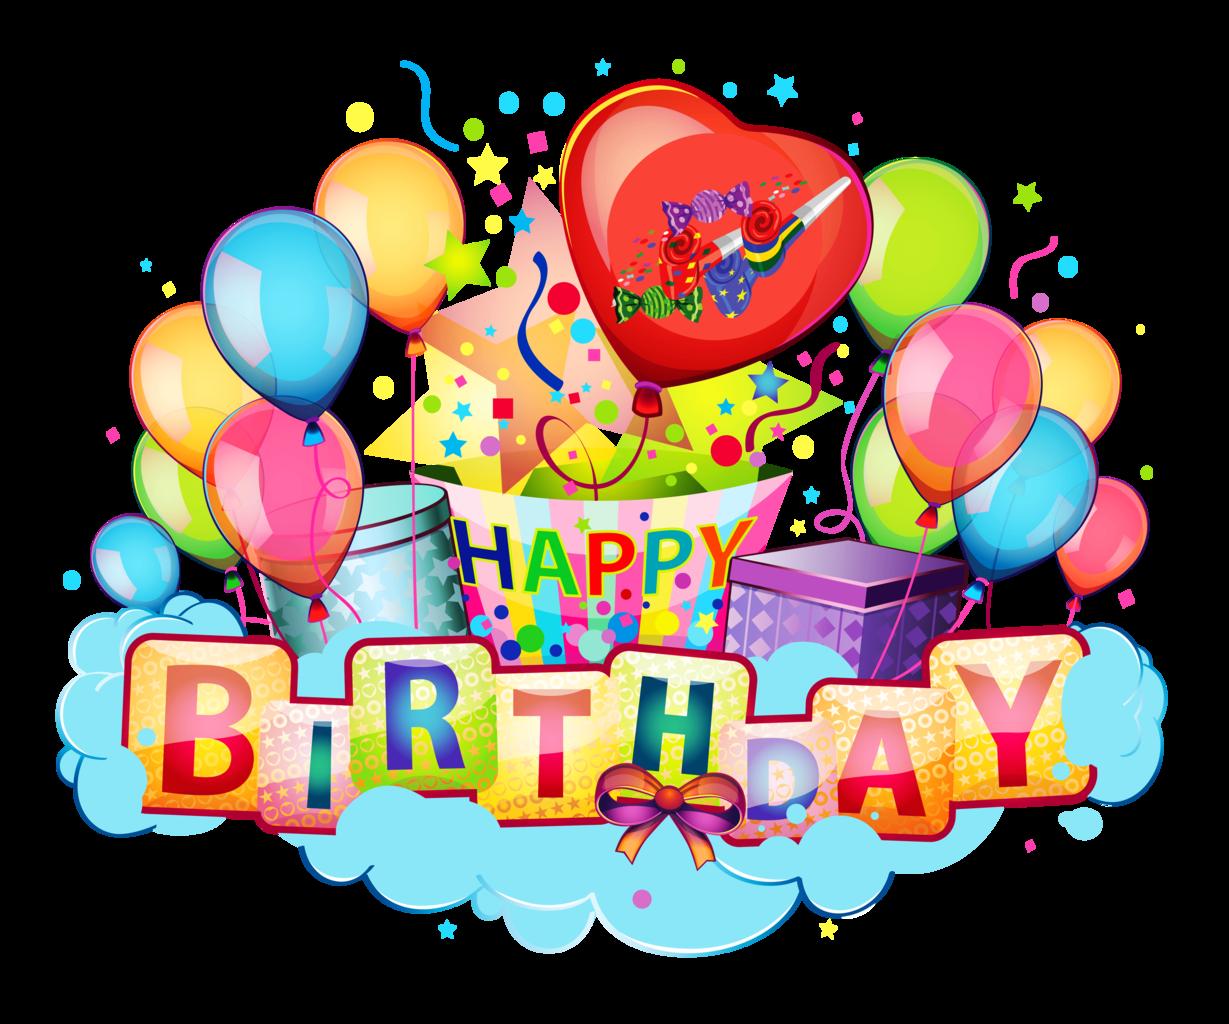 Image decor transparent picture. Decoration clipart happy birthday